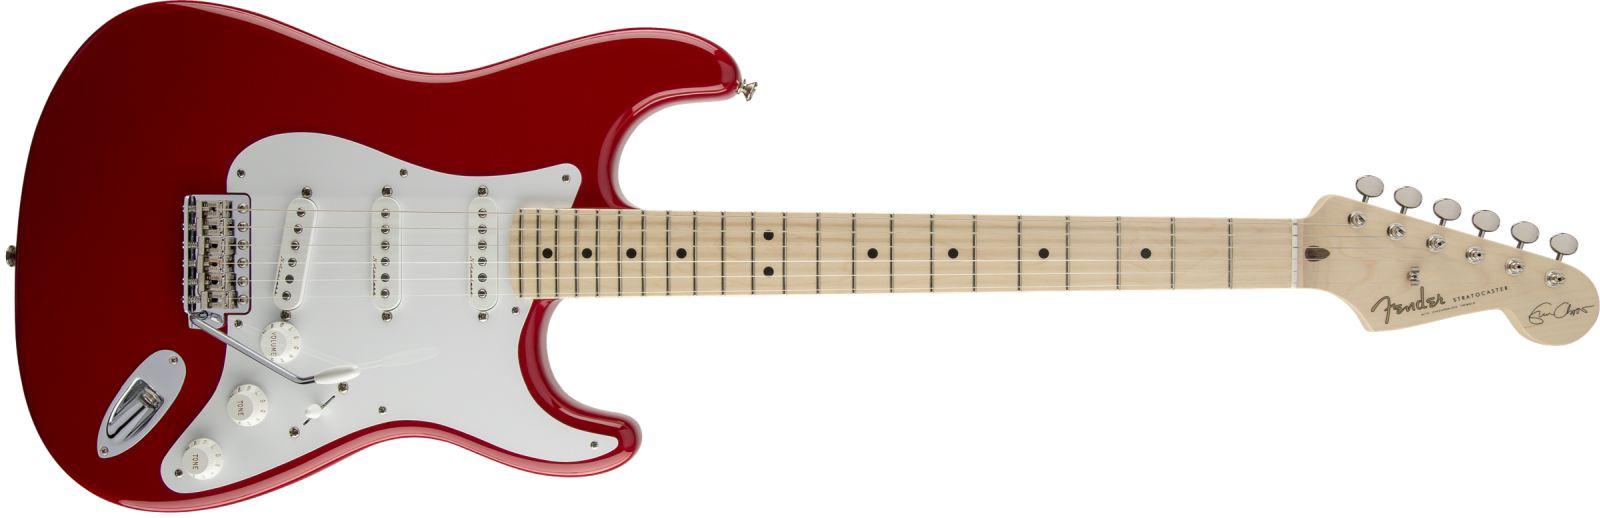 Fender Eric Clapton Signature Stratocaster MN TRD